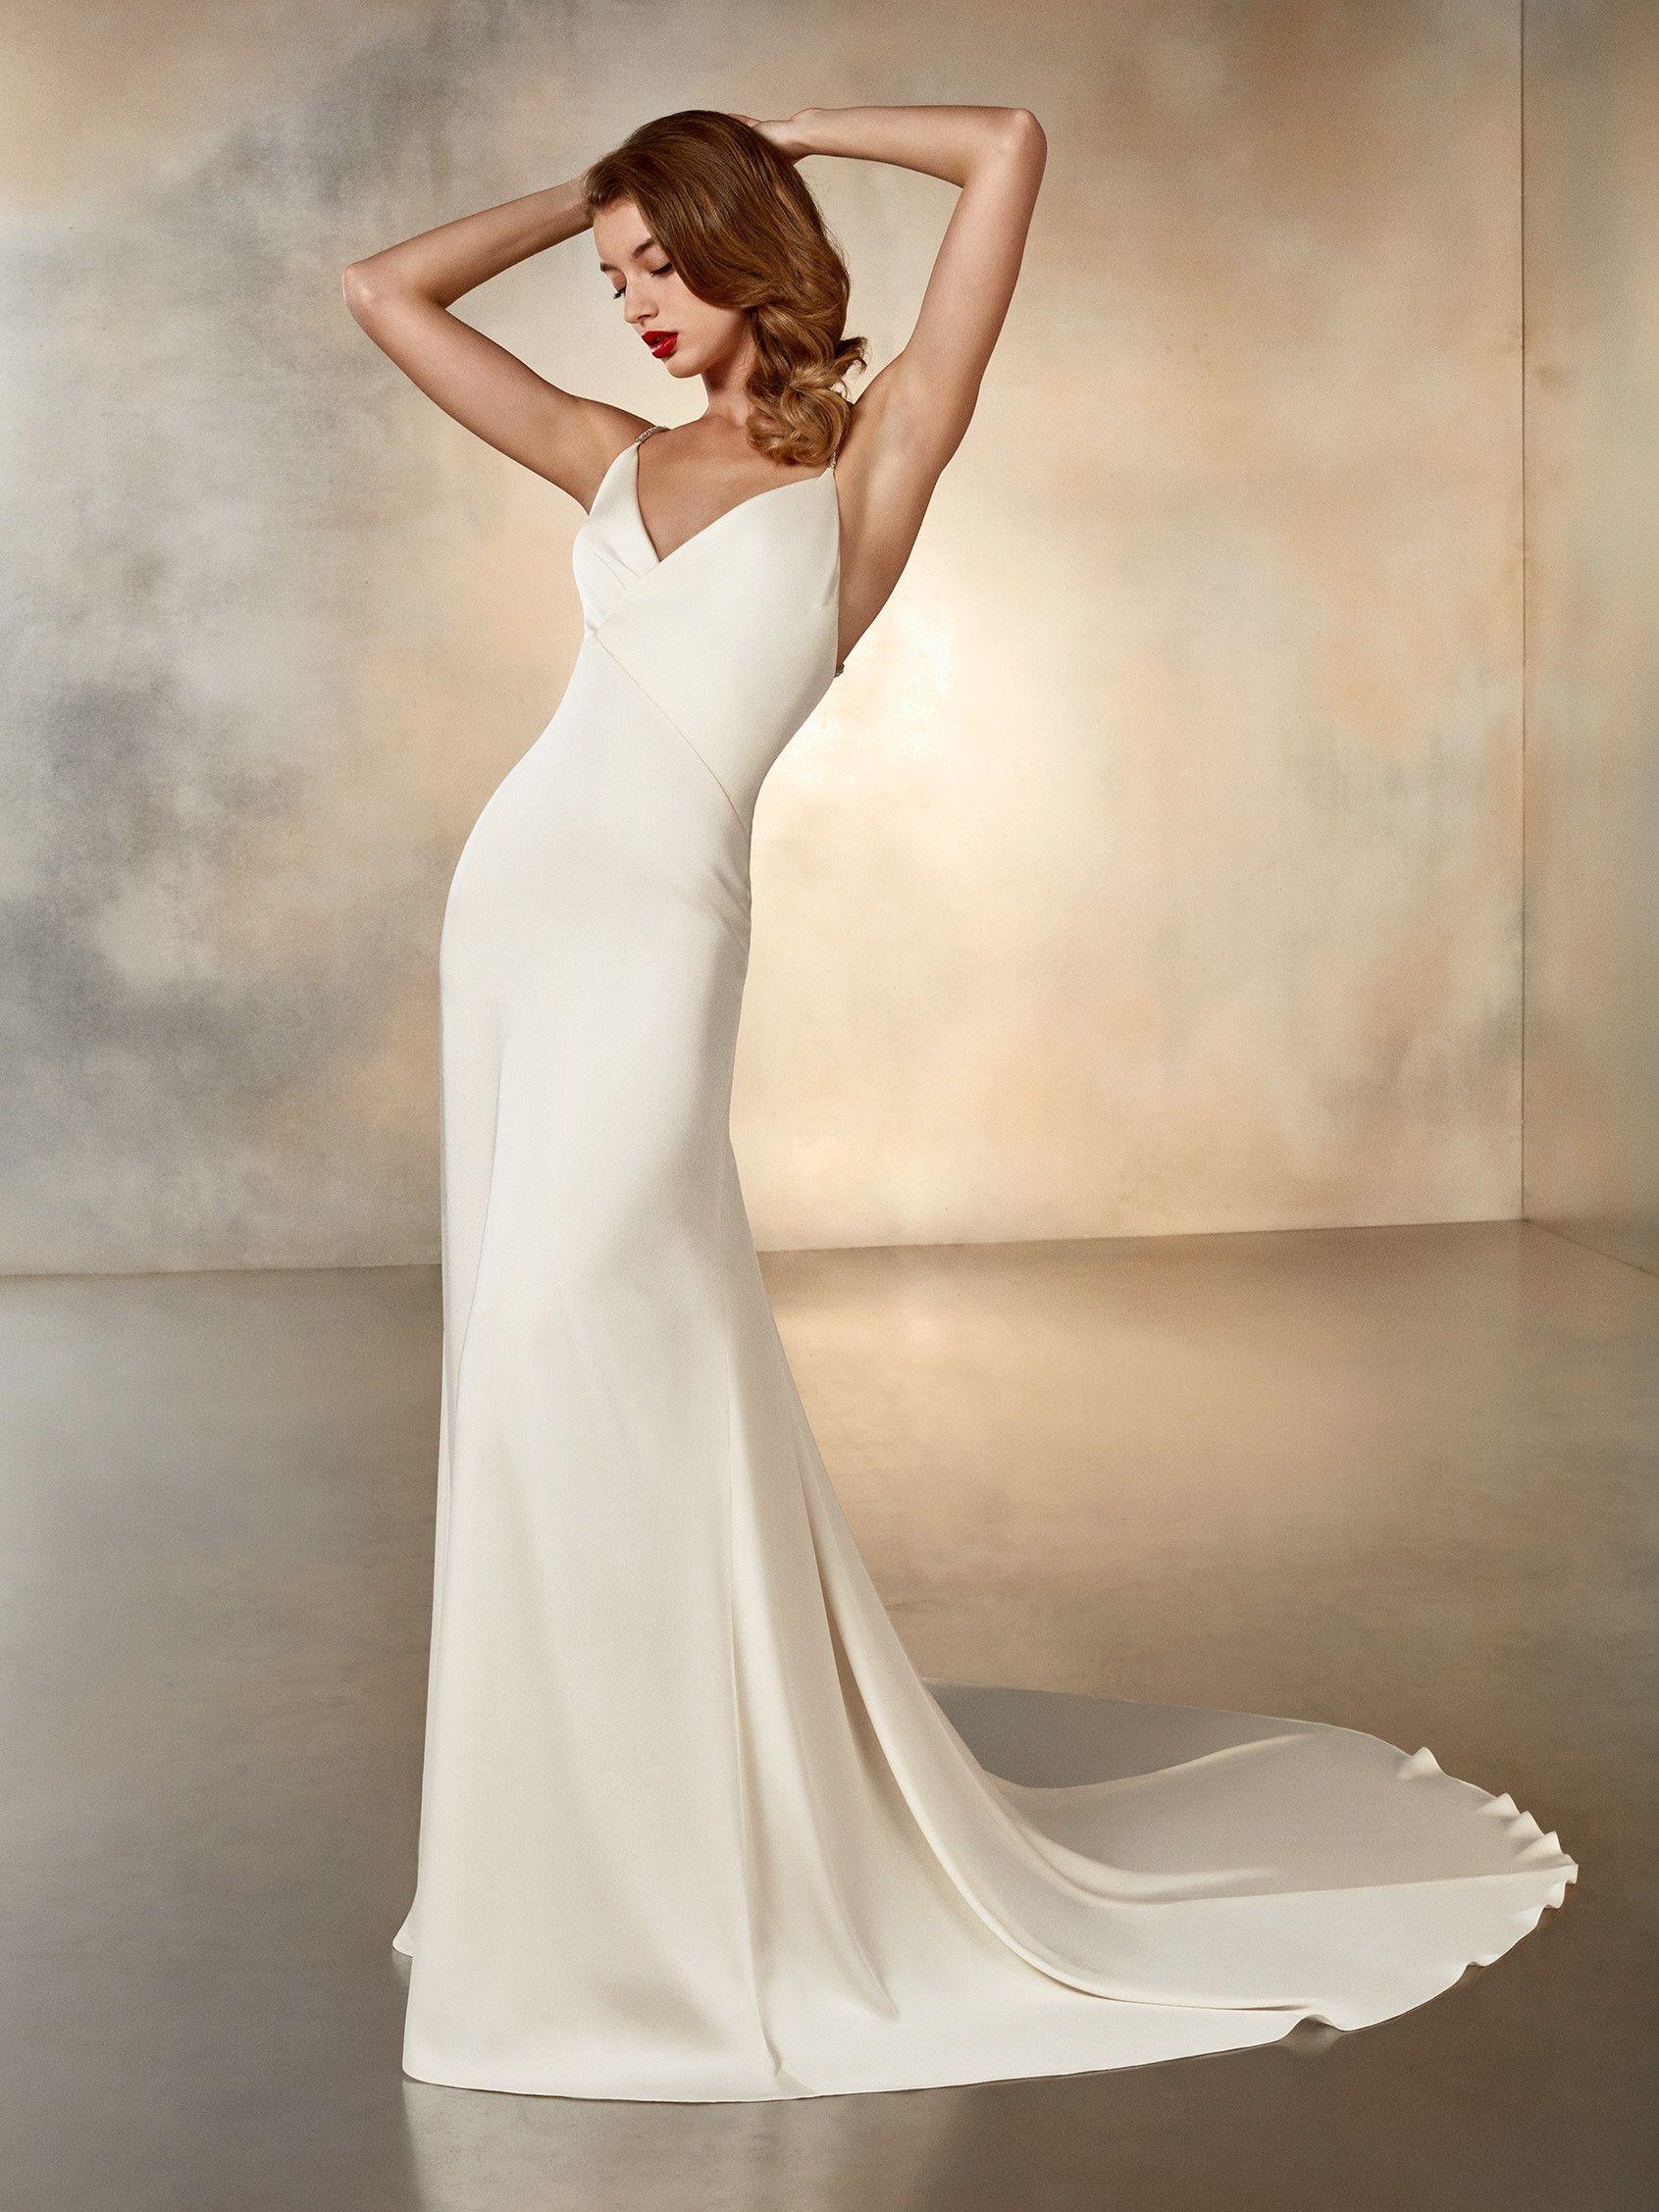 Crepe Mermaid Wedding Dress V Neck Wedding Dress Spaghetti Strap Wedding Dress In 2021 Pronovias Wedding Dress Silk Wedding Dress Pronovias Bridal [ 2255 x 1691 Pixel ]